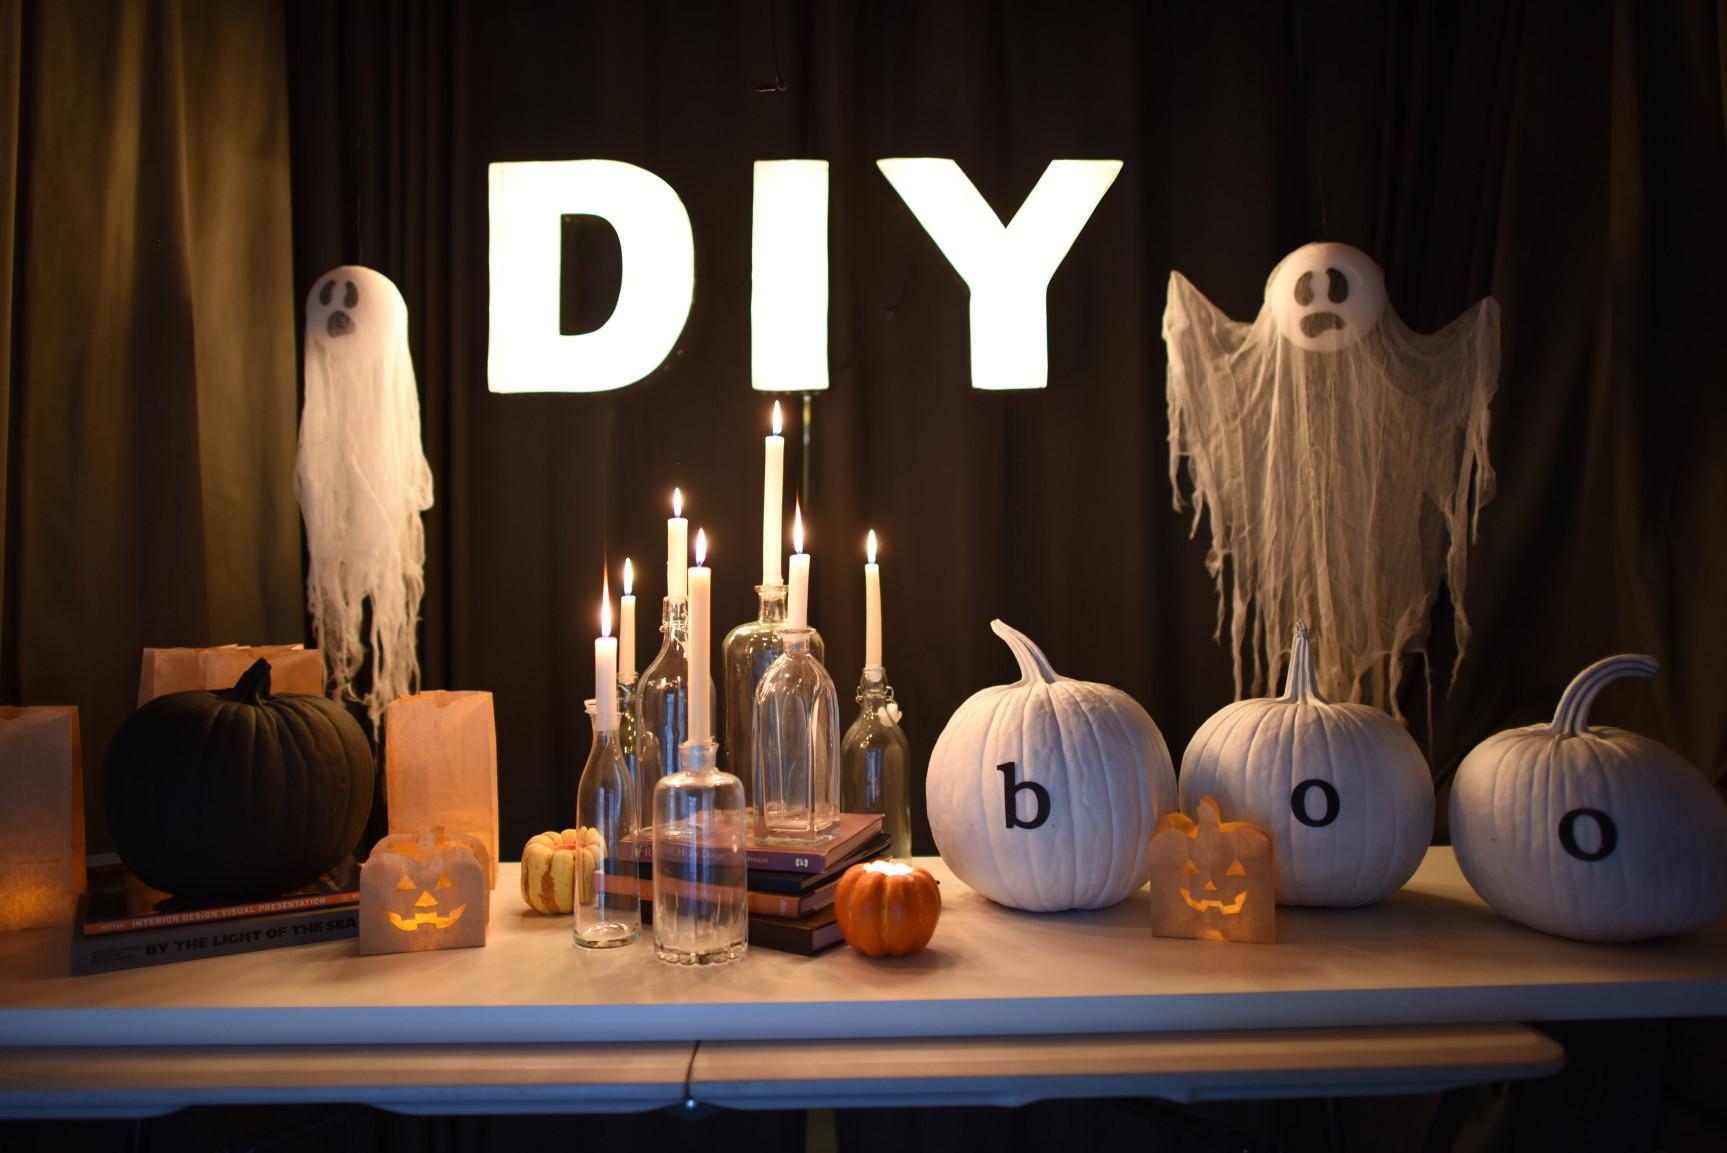 Diy Halloween Party Decoration Ideas  5 Easy Creepy Yet Classy Halloween Party Decorations [on a